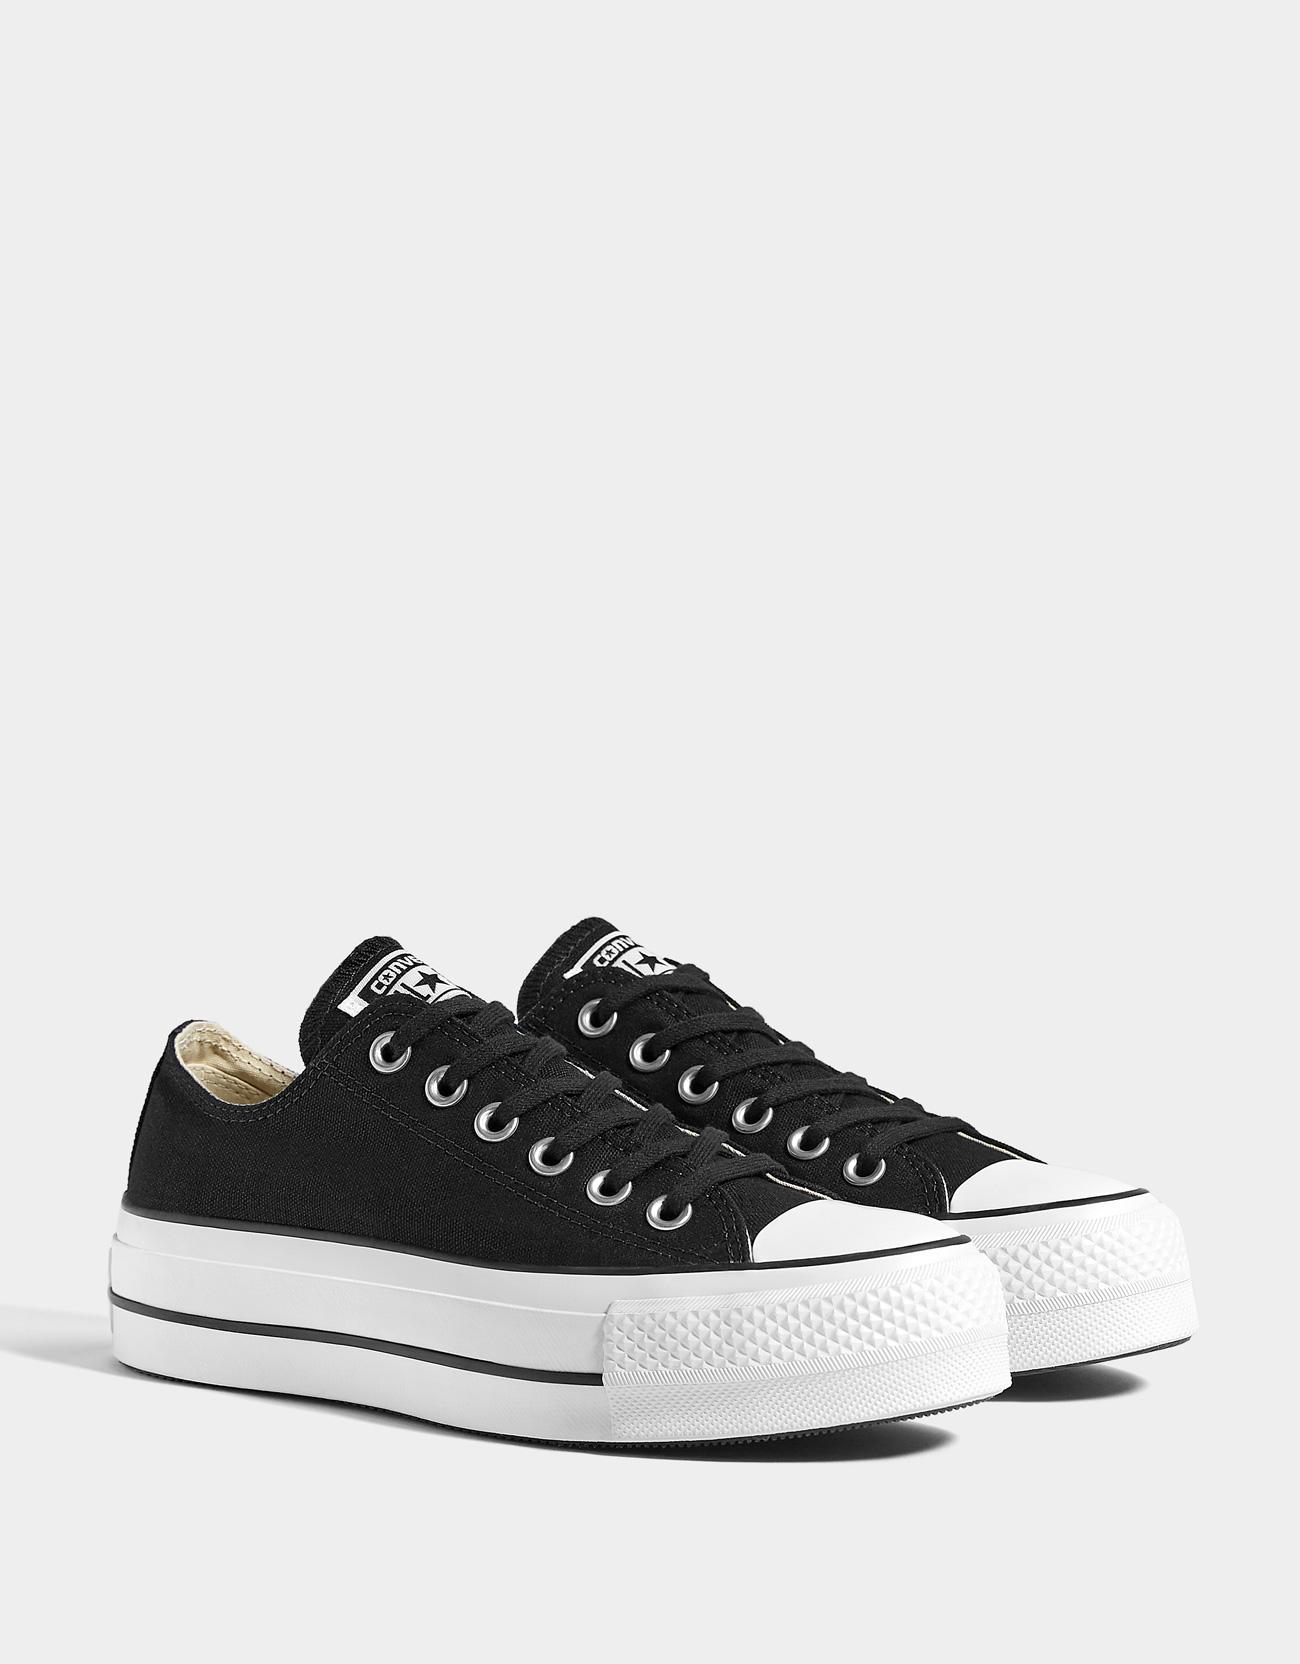 ccb9facd7a16 CONVERSE CHUCK TAYLOR ALL STAR platform sneakers - Shoes - Bershka ...